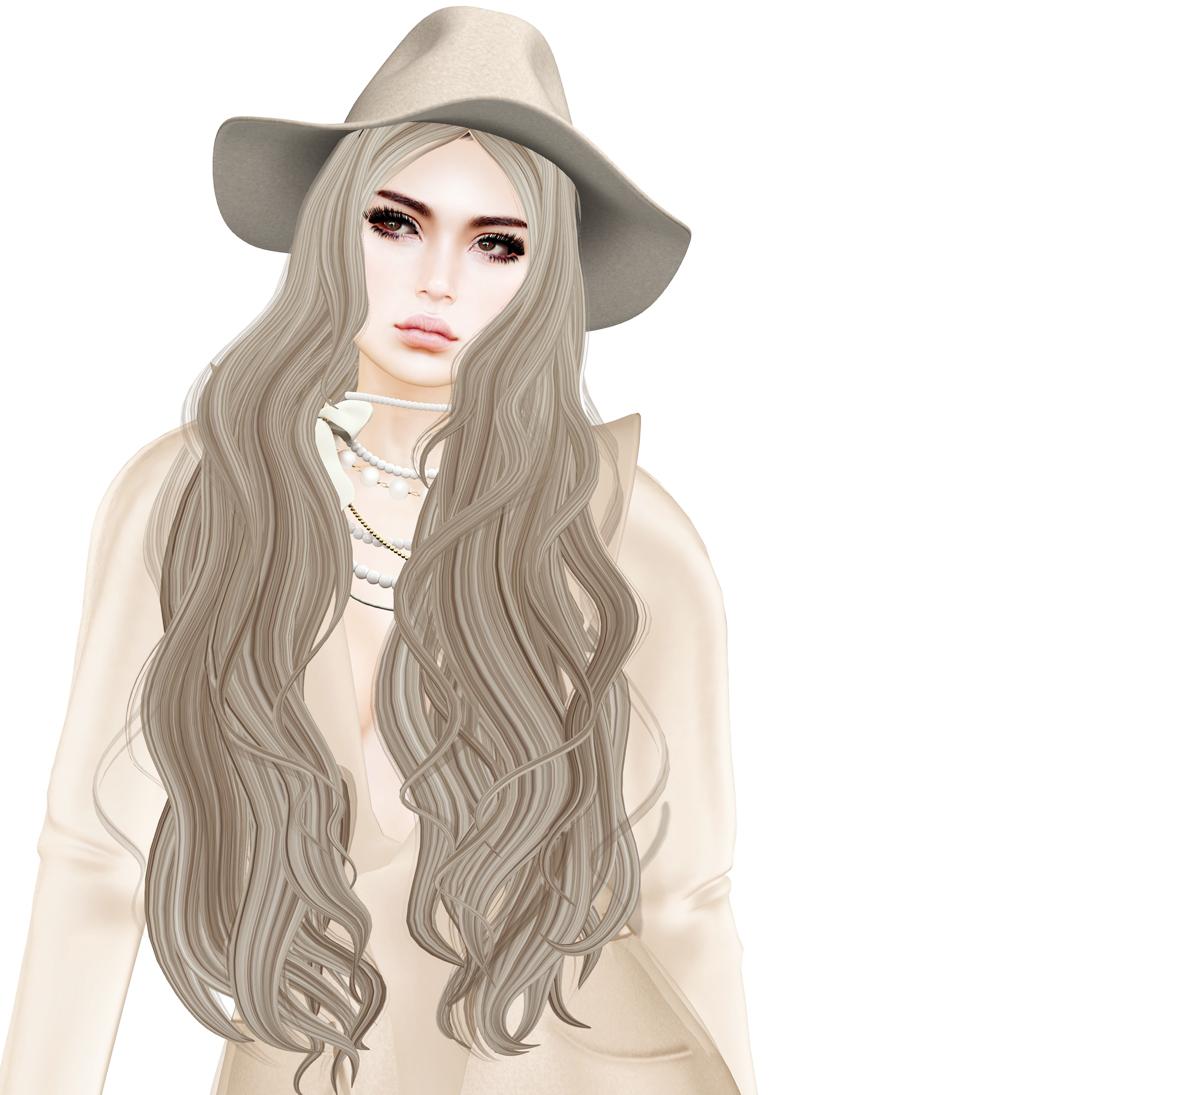 beige isnt plain